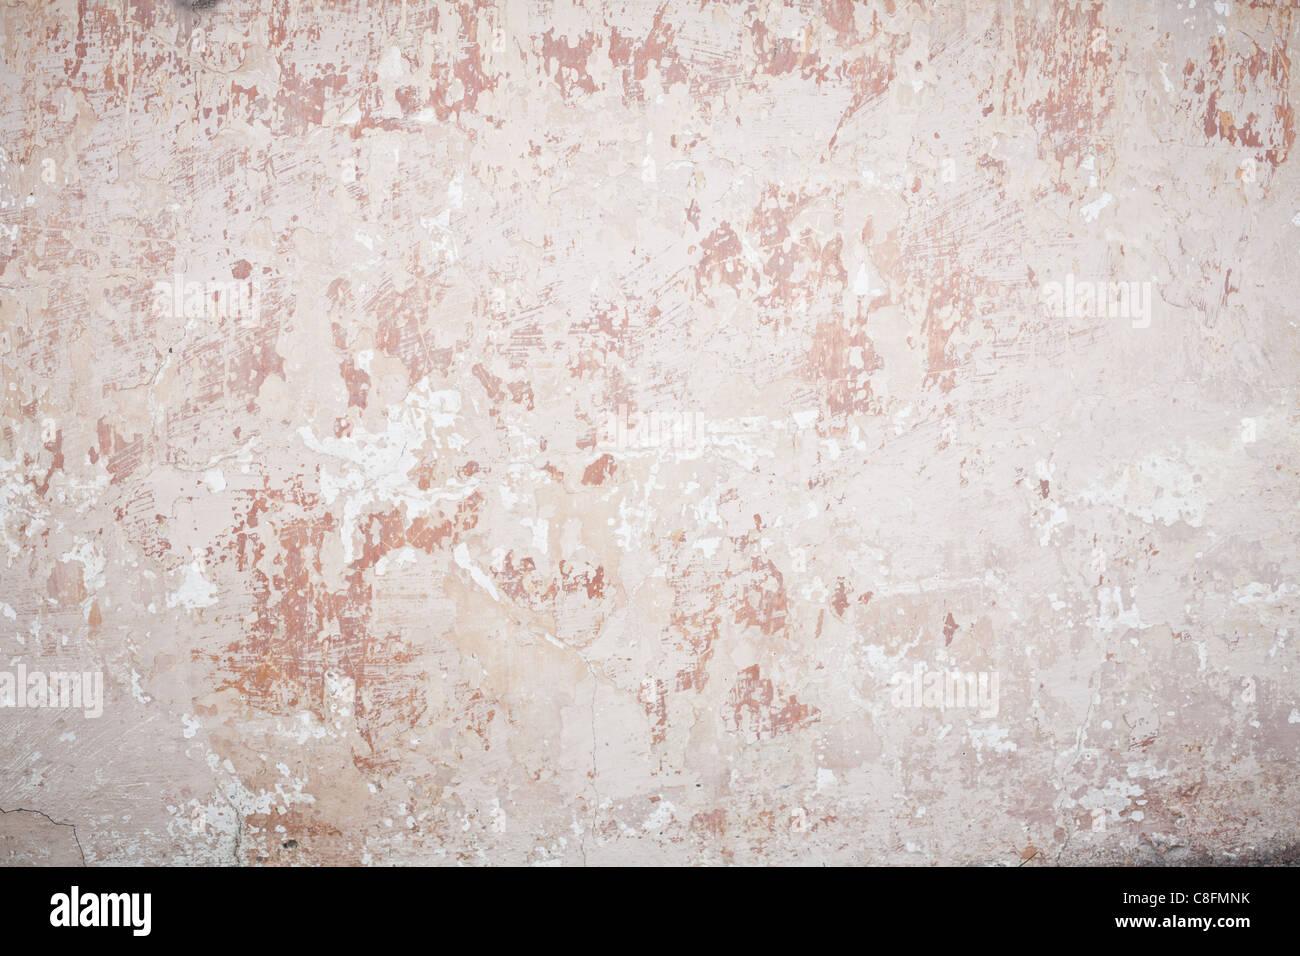 Viejo muro dañado Imagen De Stock